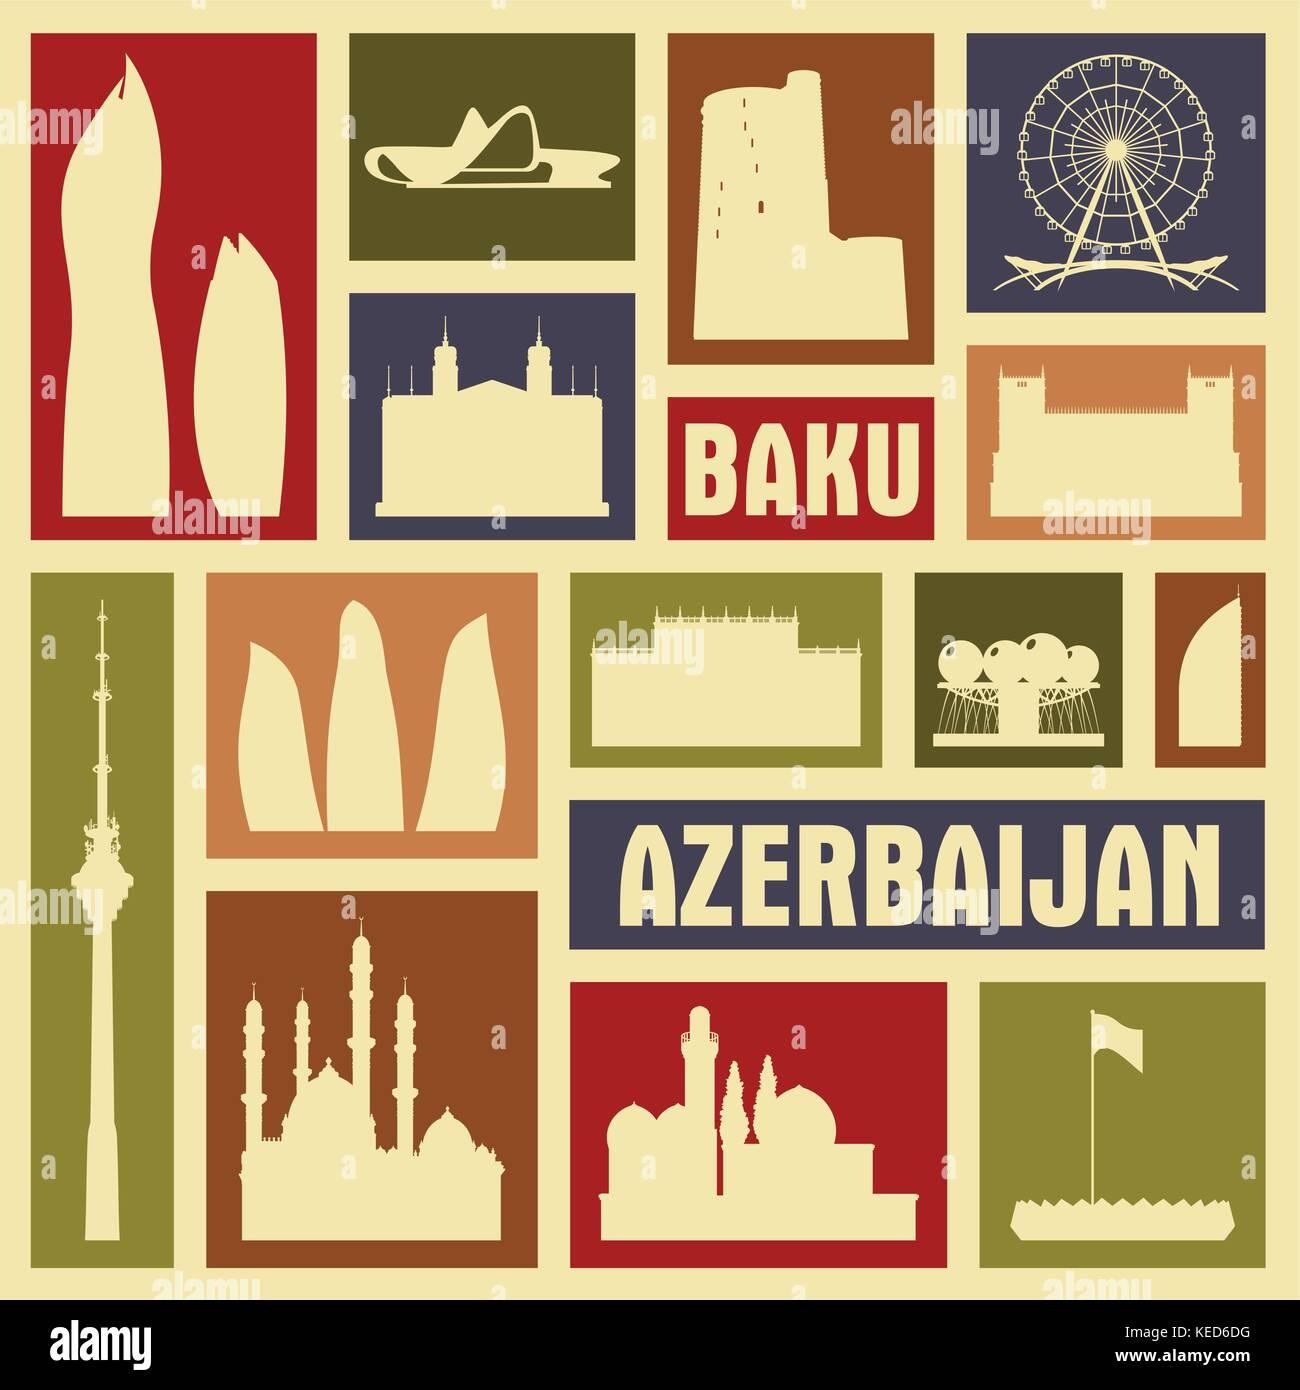 Baku Azerbaijan city icon symbol silhouette set. Vector background illustration - Stock Vector